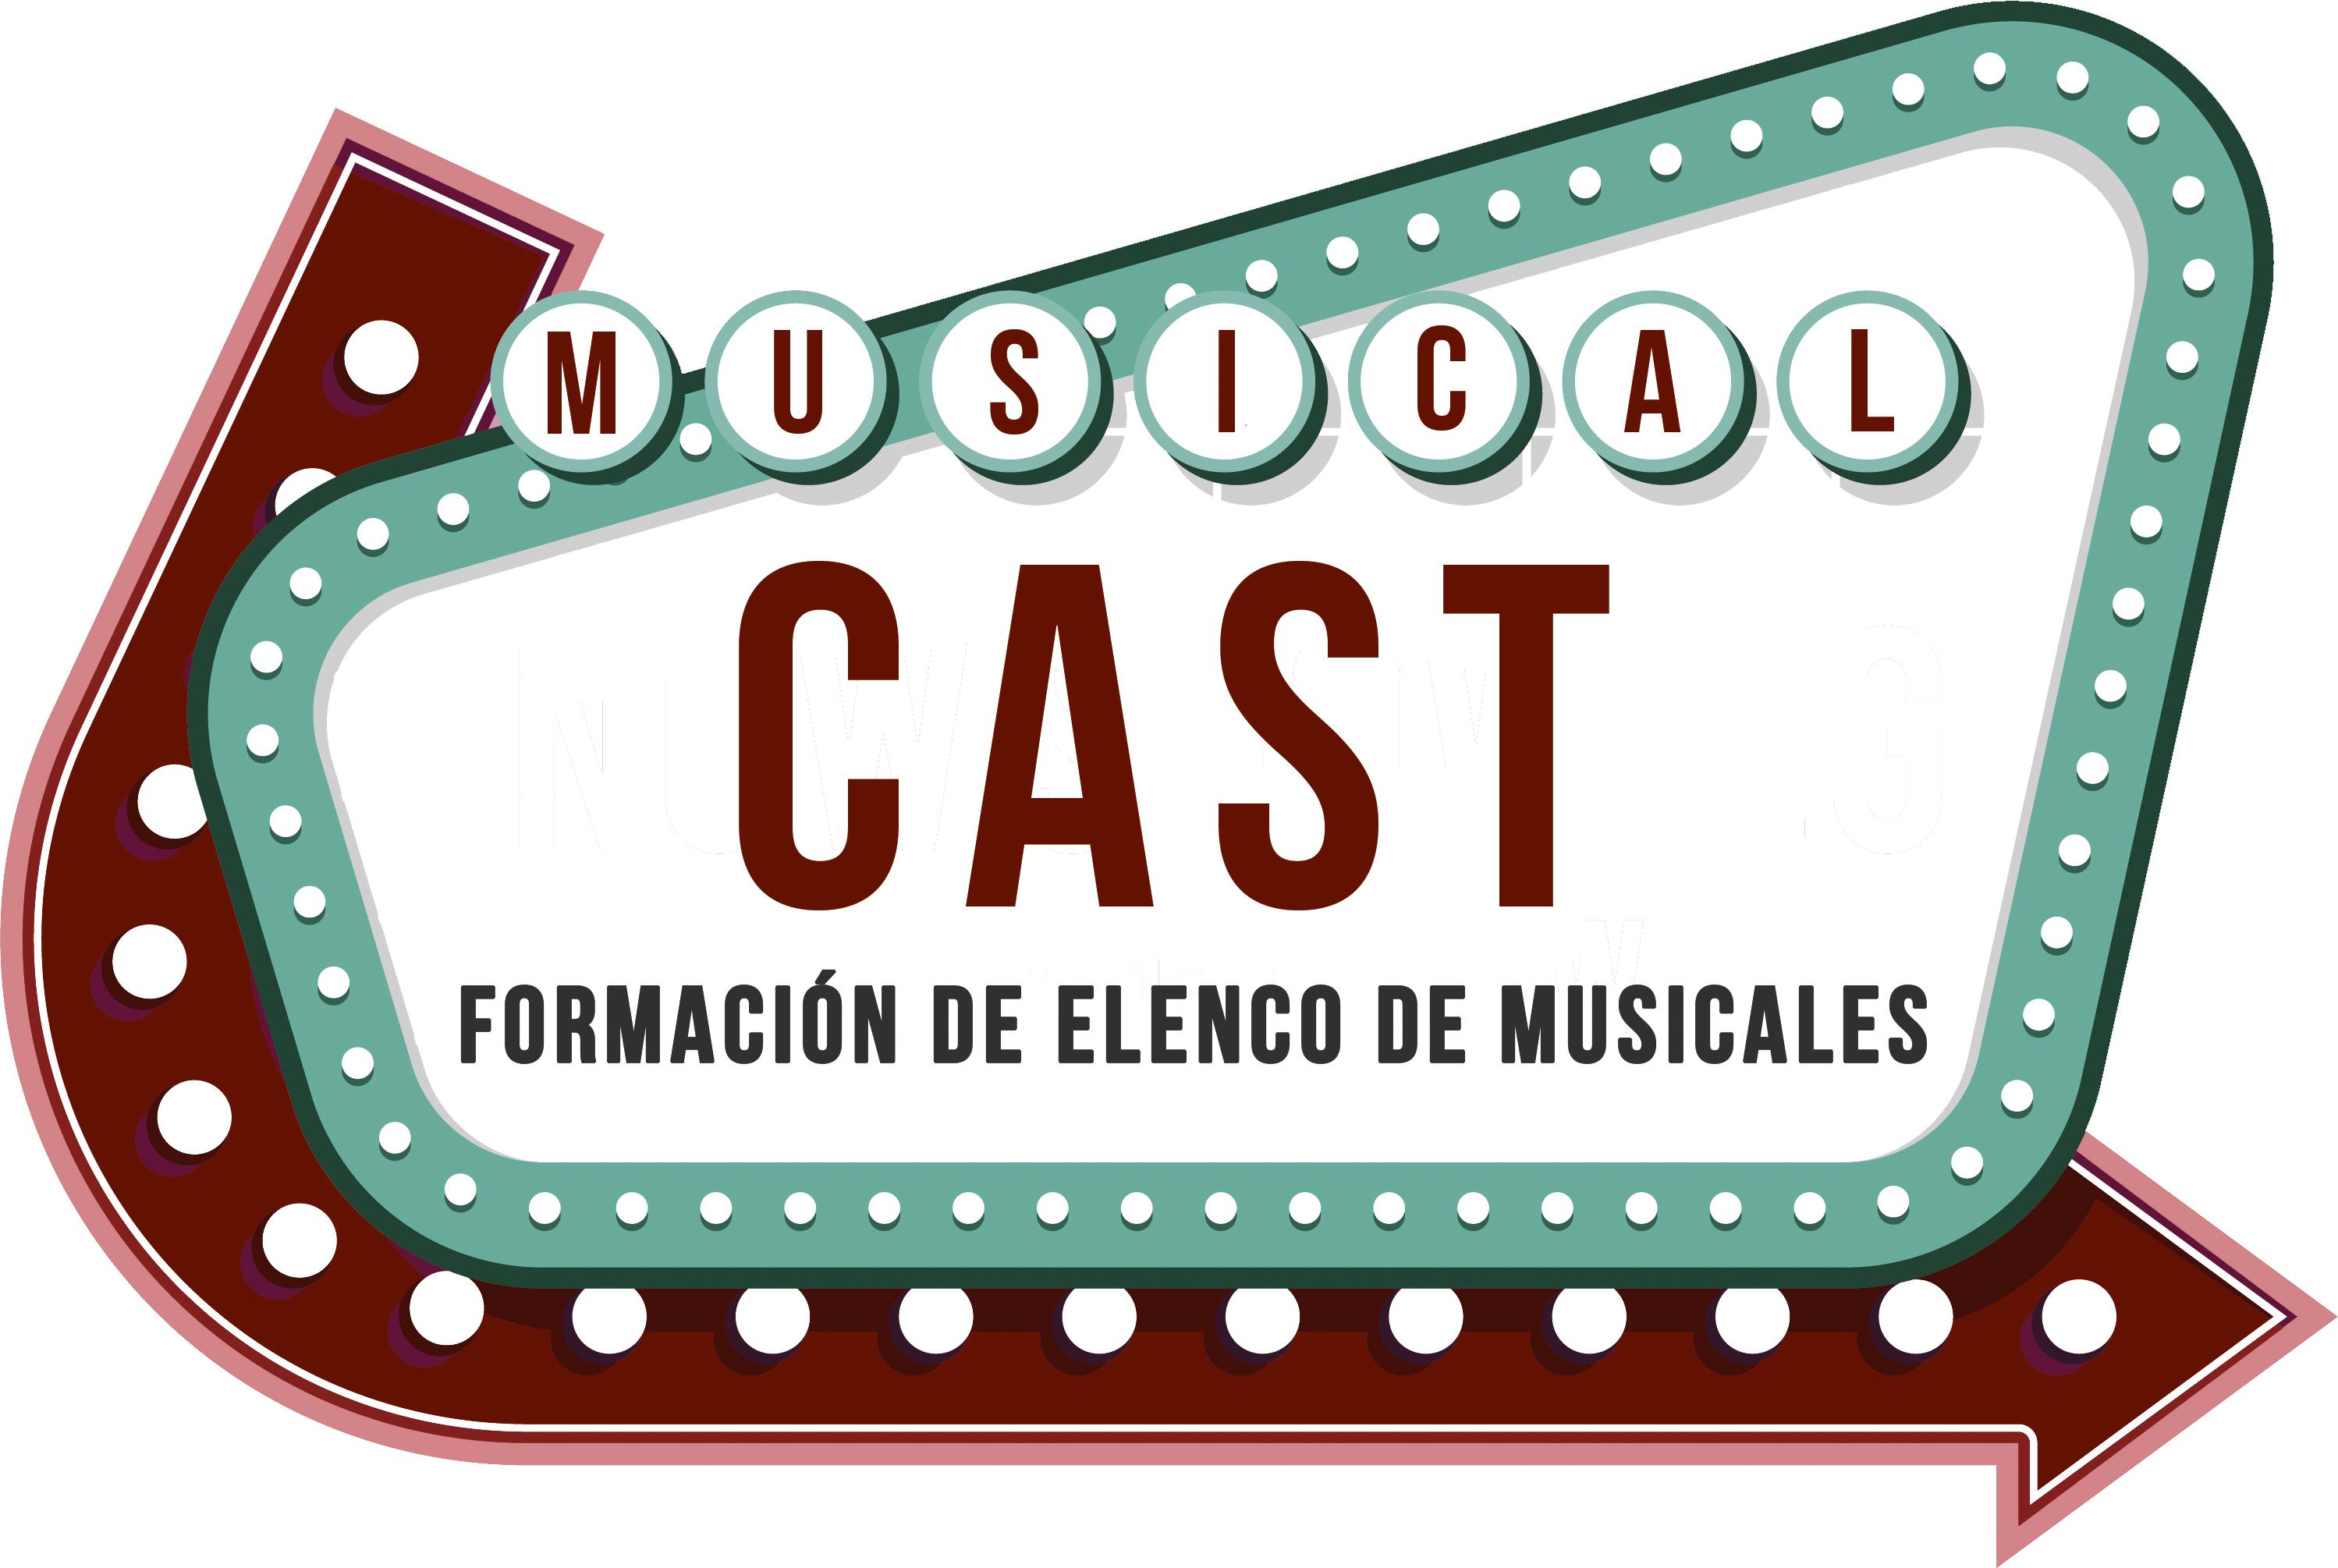 musical_cast_logo